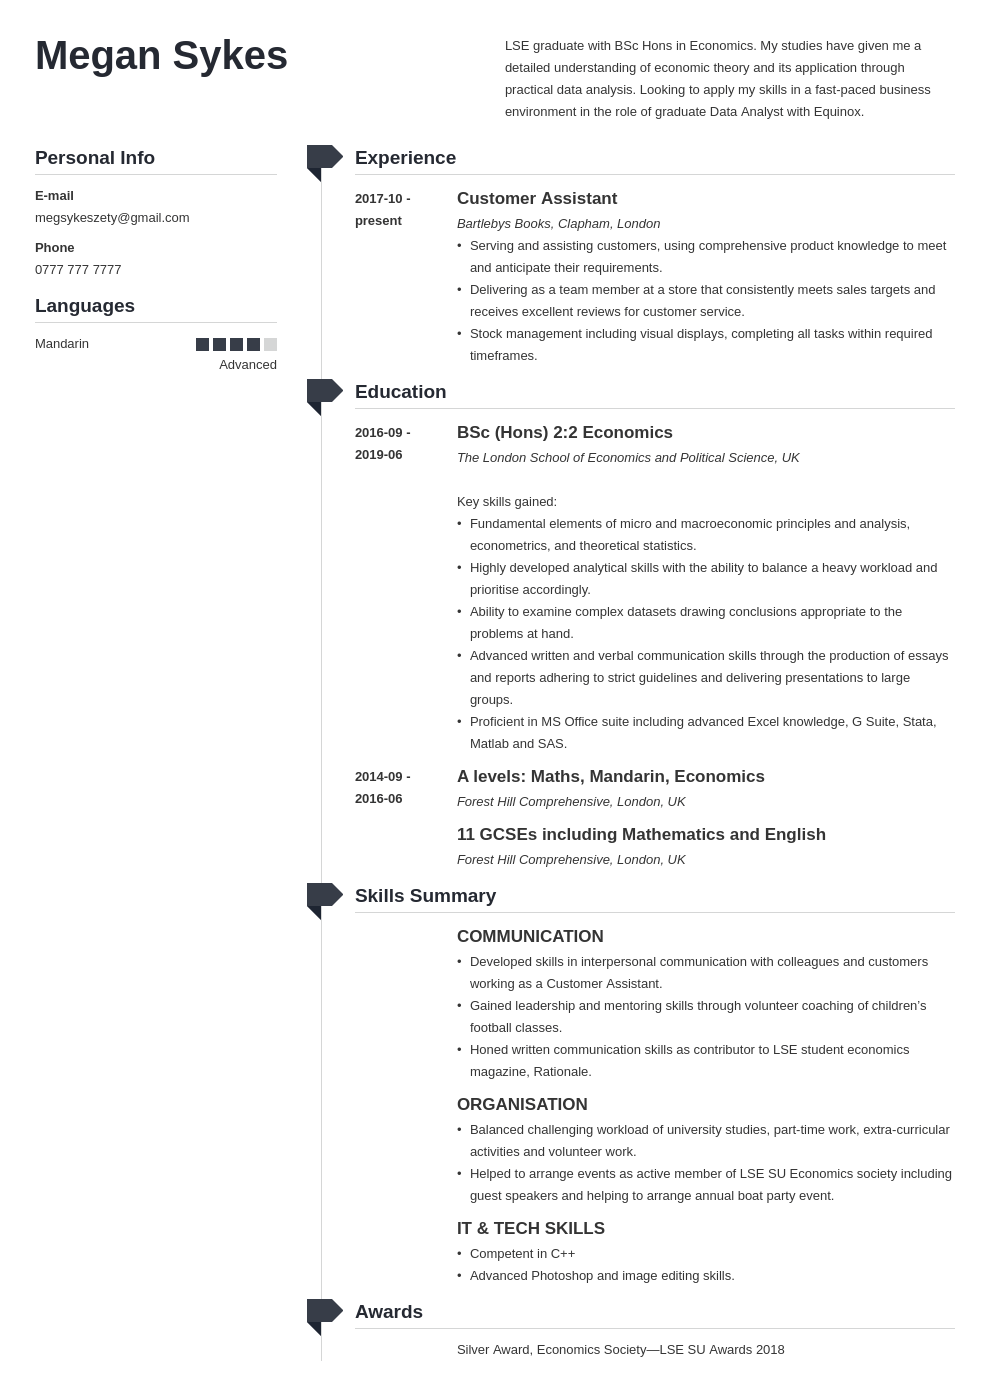 uk graduate cv example template muse Resume examples, Cv